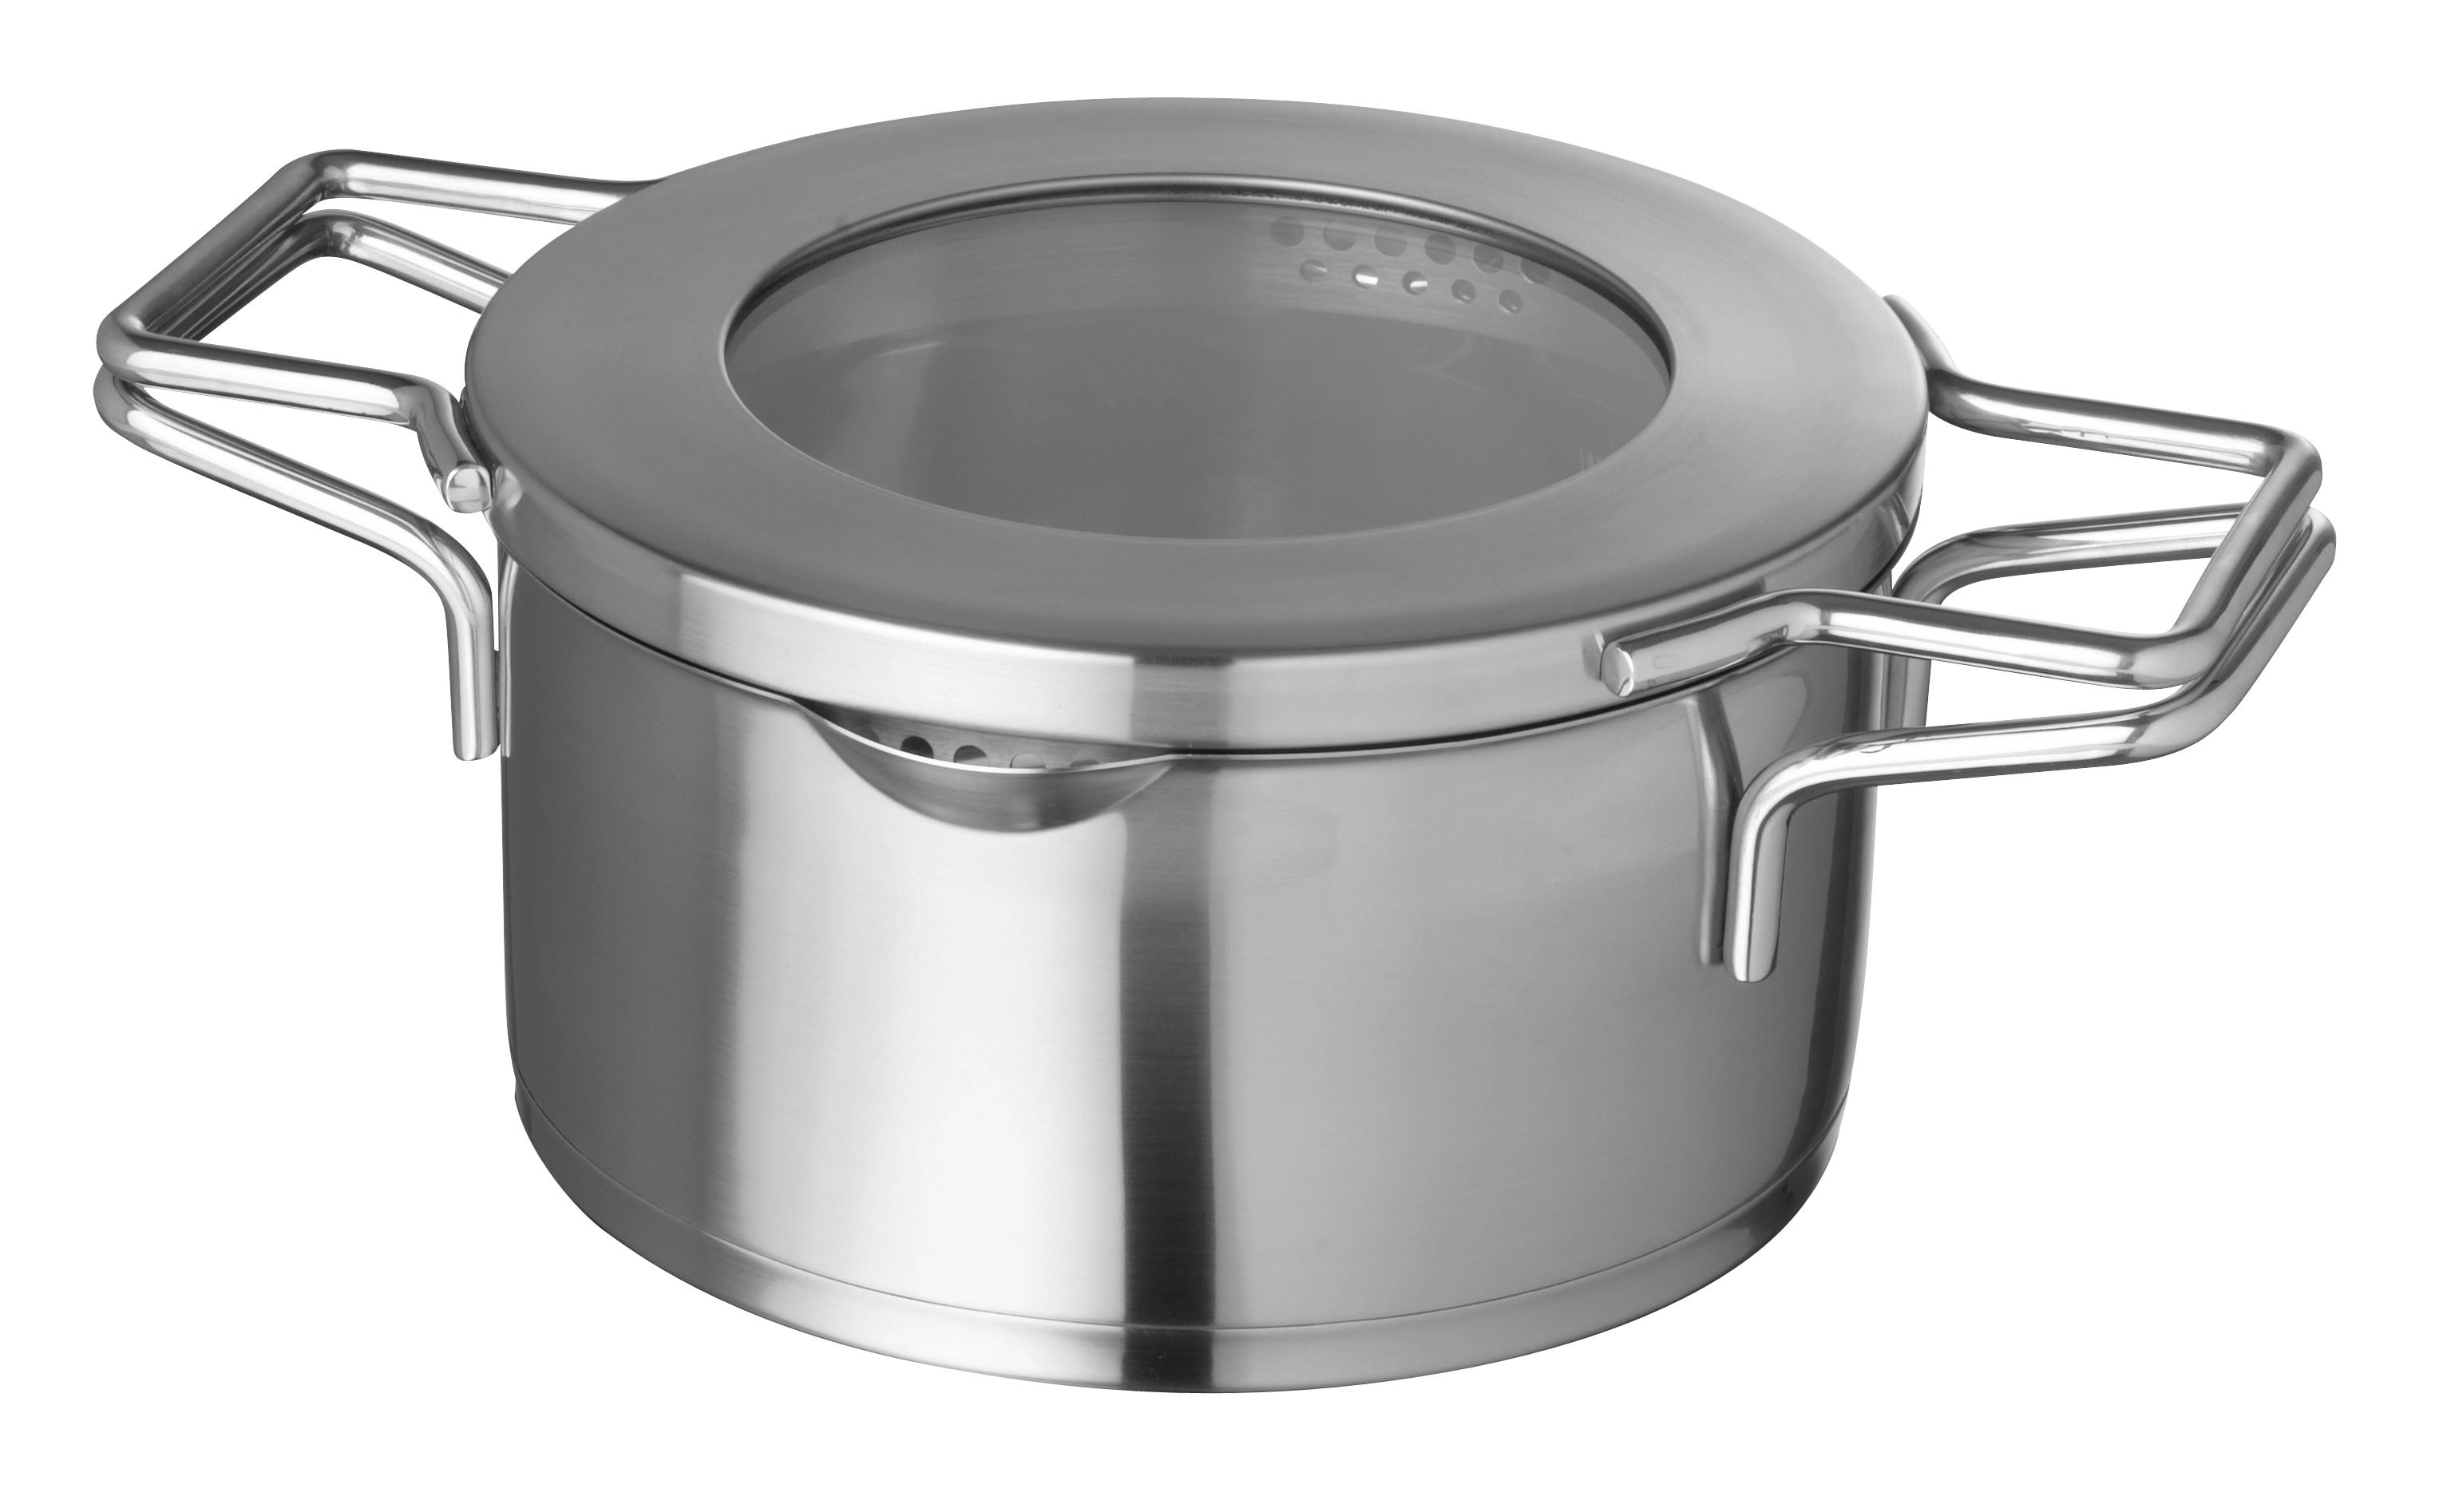 OBH Nordica Supreme Steel Gryte 3 liter